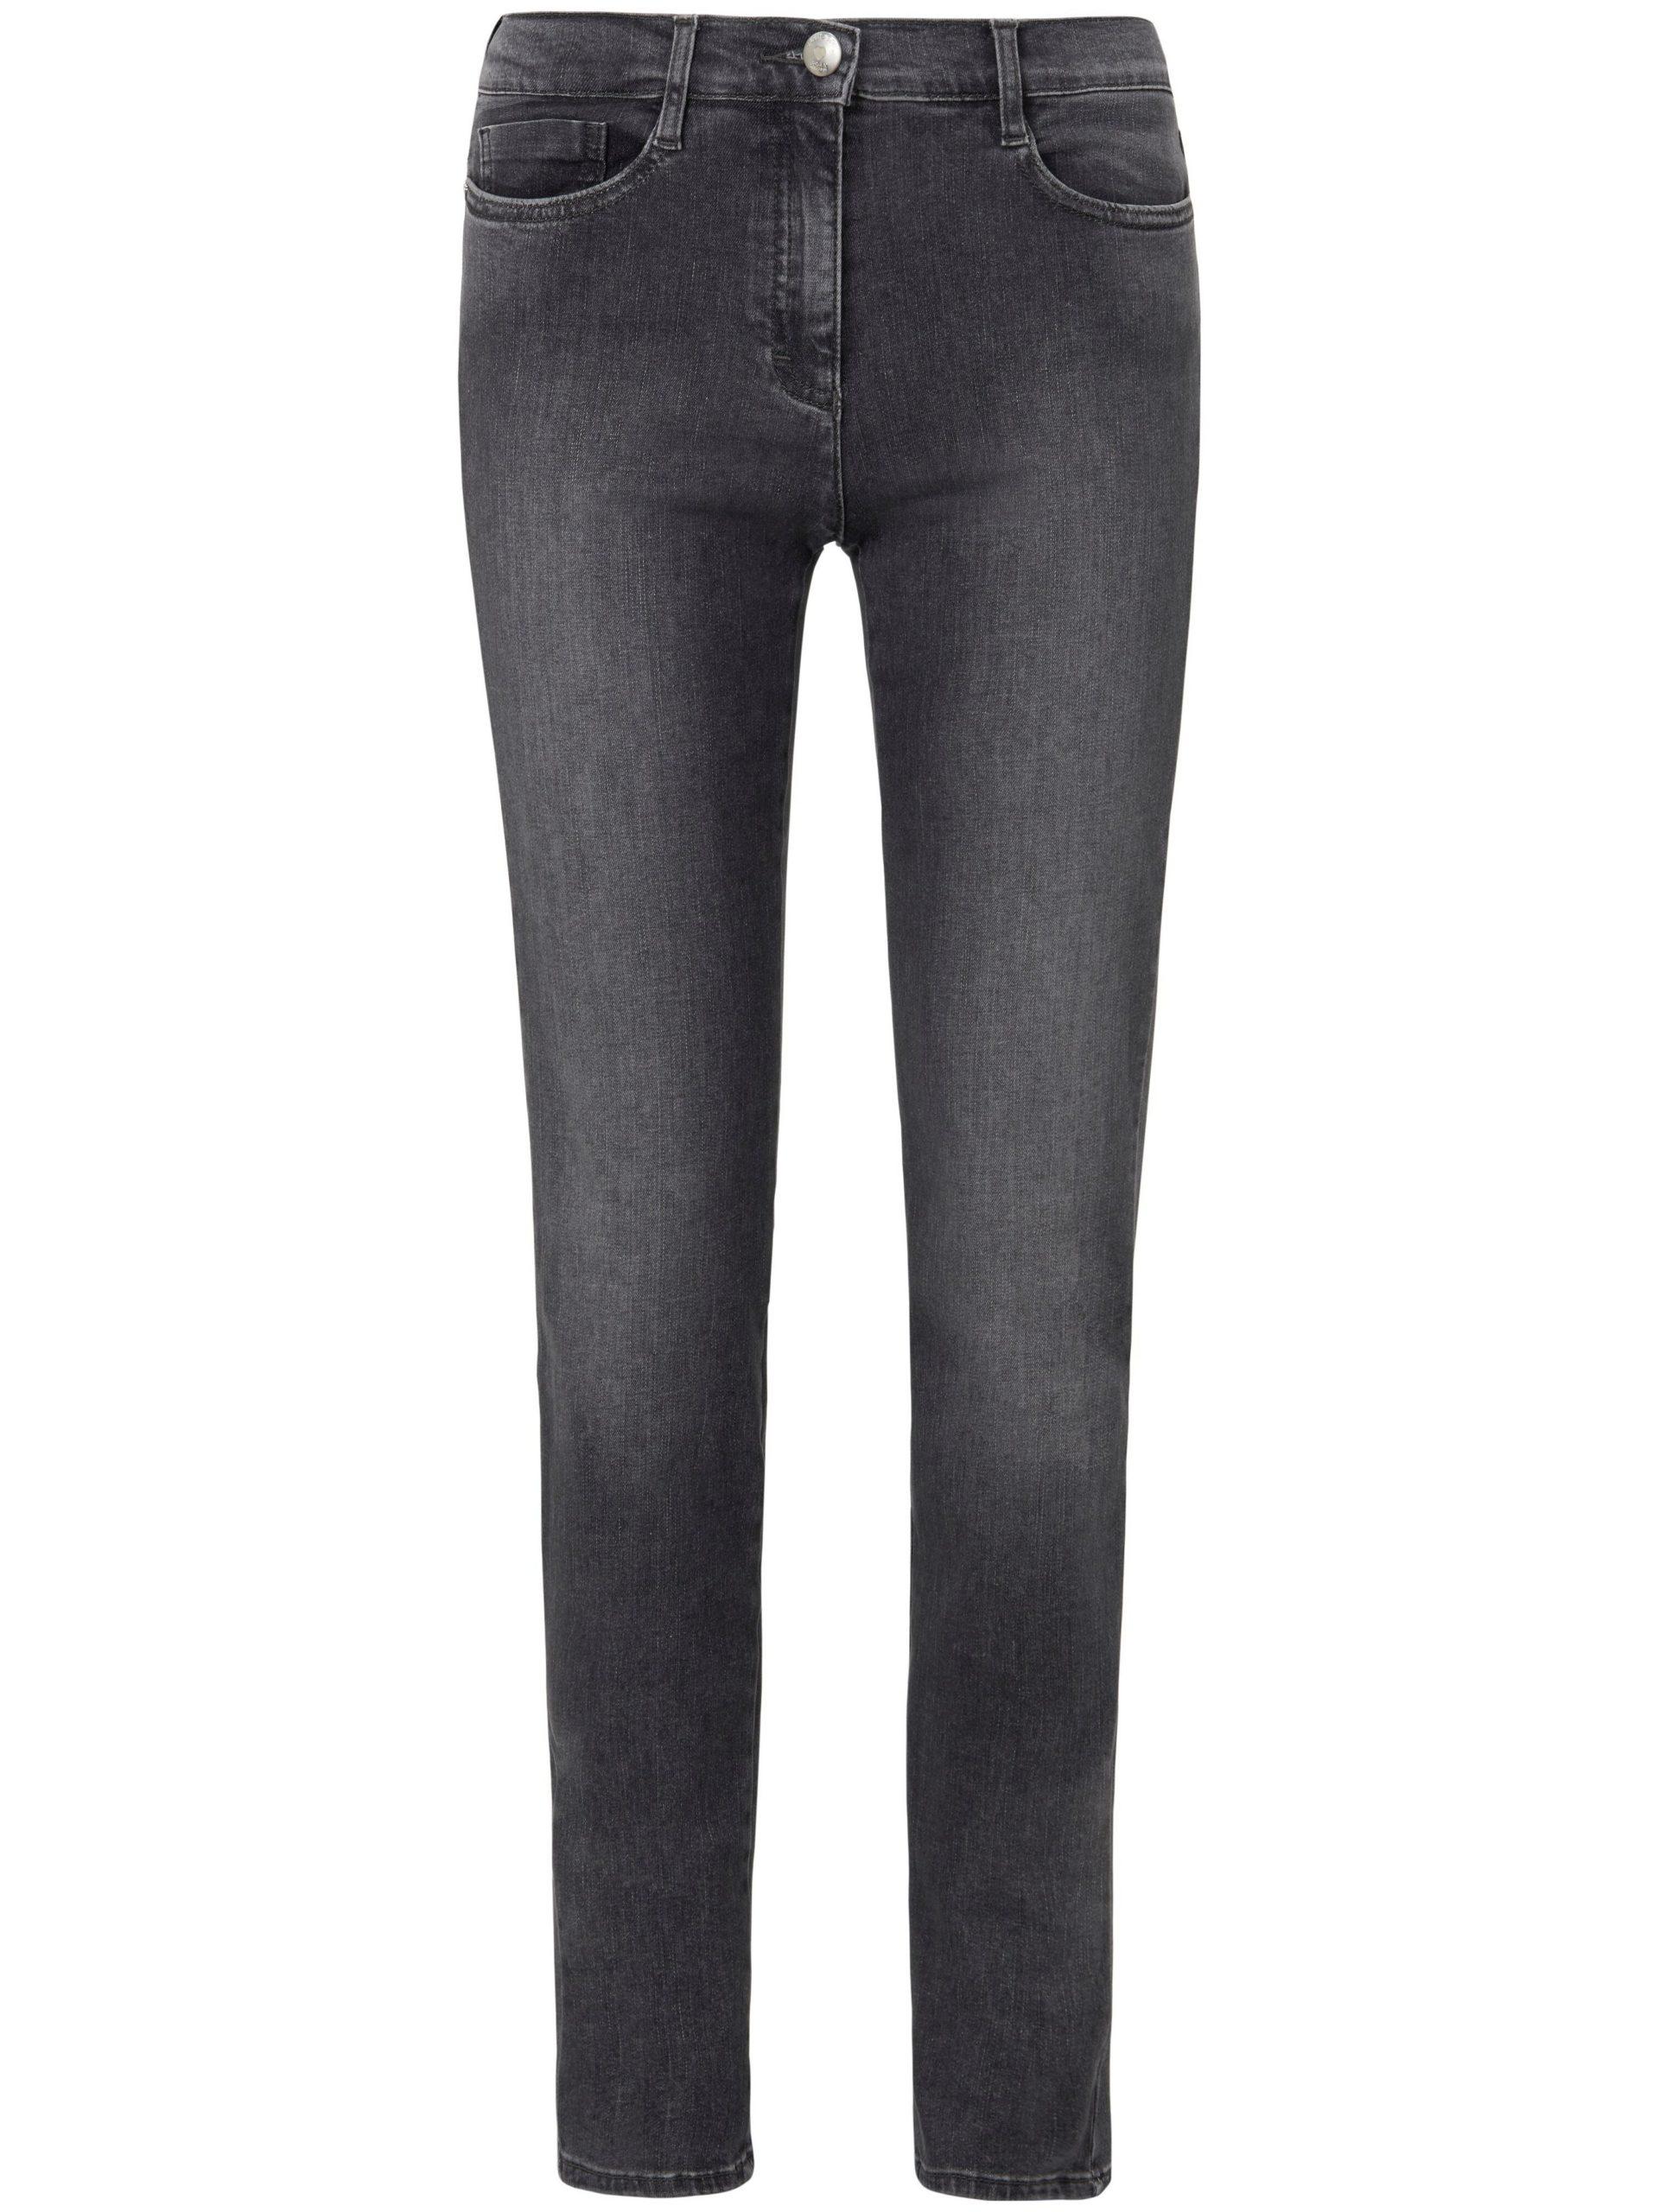 Slim fit jeans Van Brax Feel Good denim Kopen